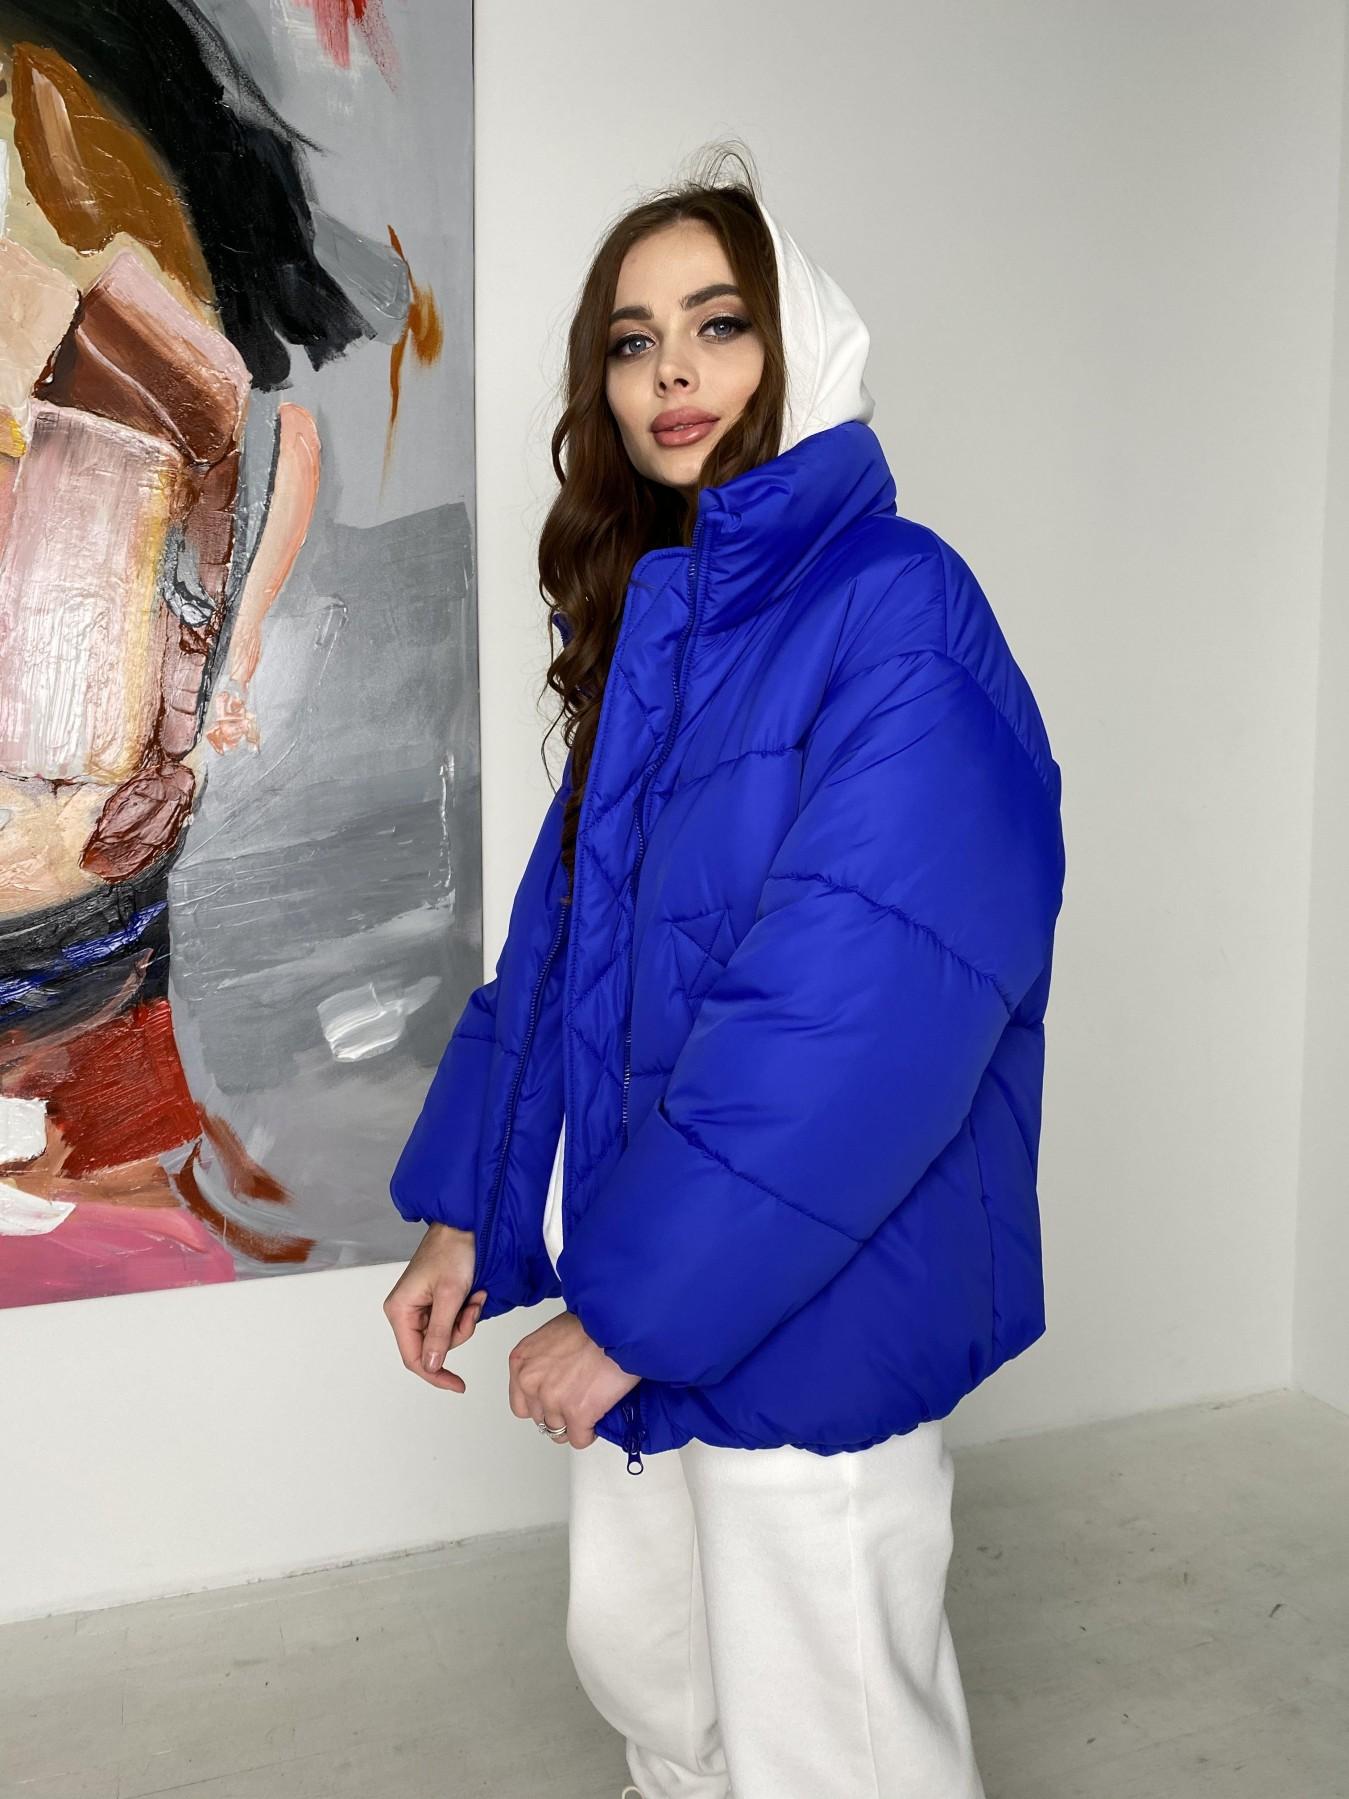 Муд куртка из плащевой ткани 10509 АРТ. 46852 Цвет: Электрик - фото 5, интернет магазин tm-modus.ru